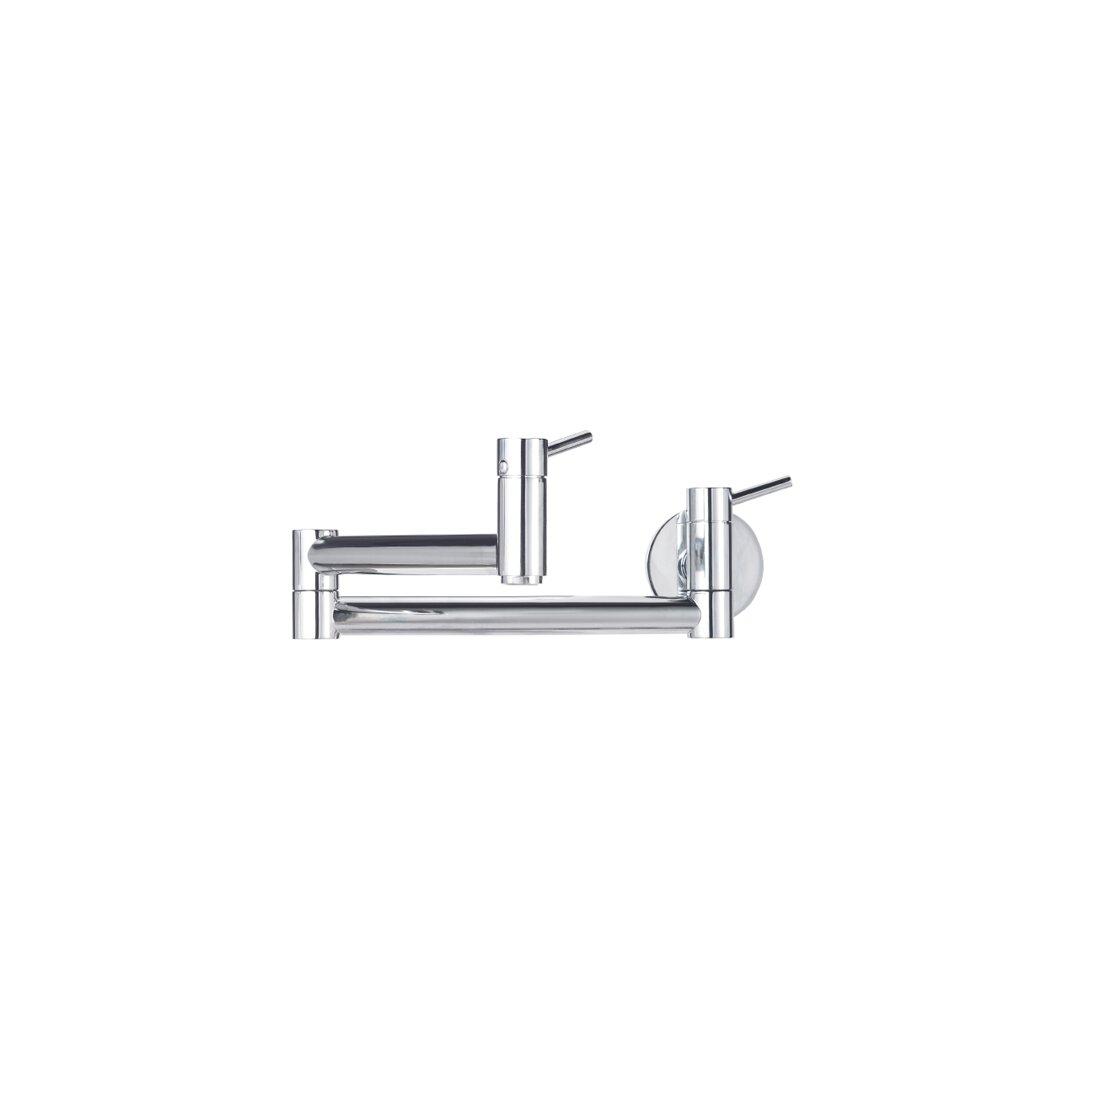 Blanco Kitchen Faucet Reviews Blanco Cantata Double Handle Pot Filler Faucet Reviews Wayfair